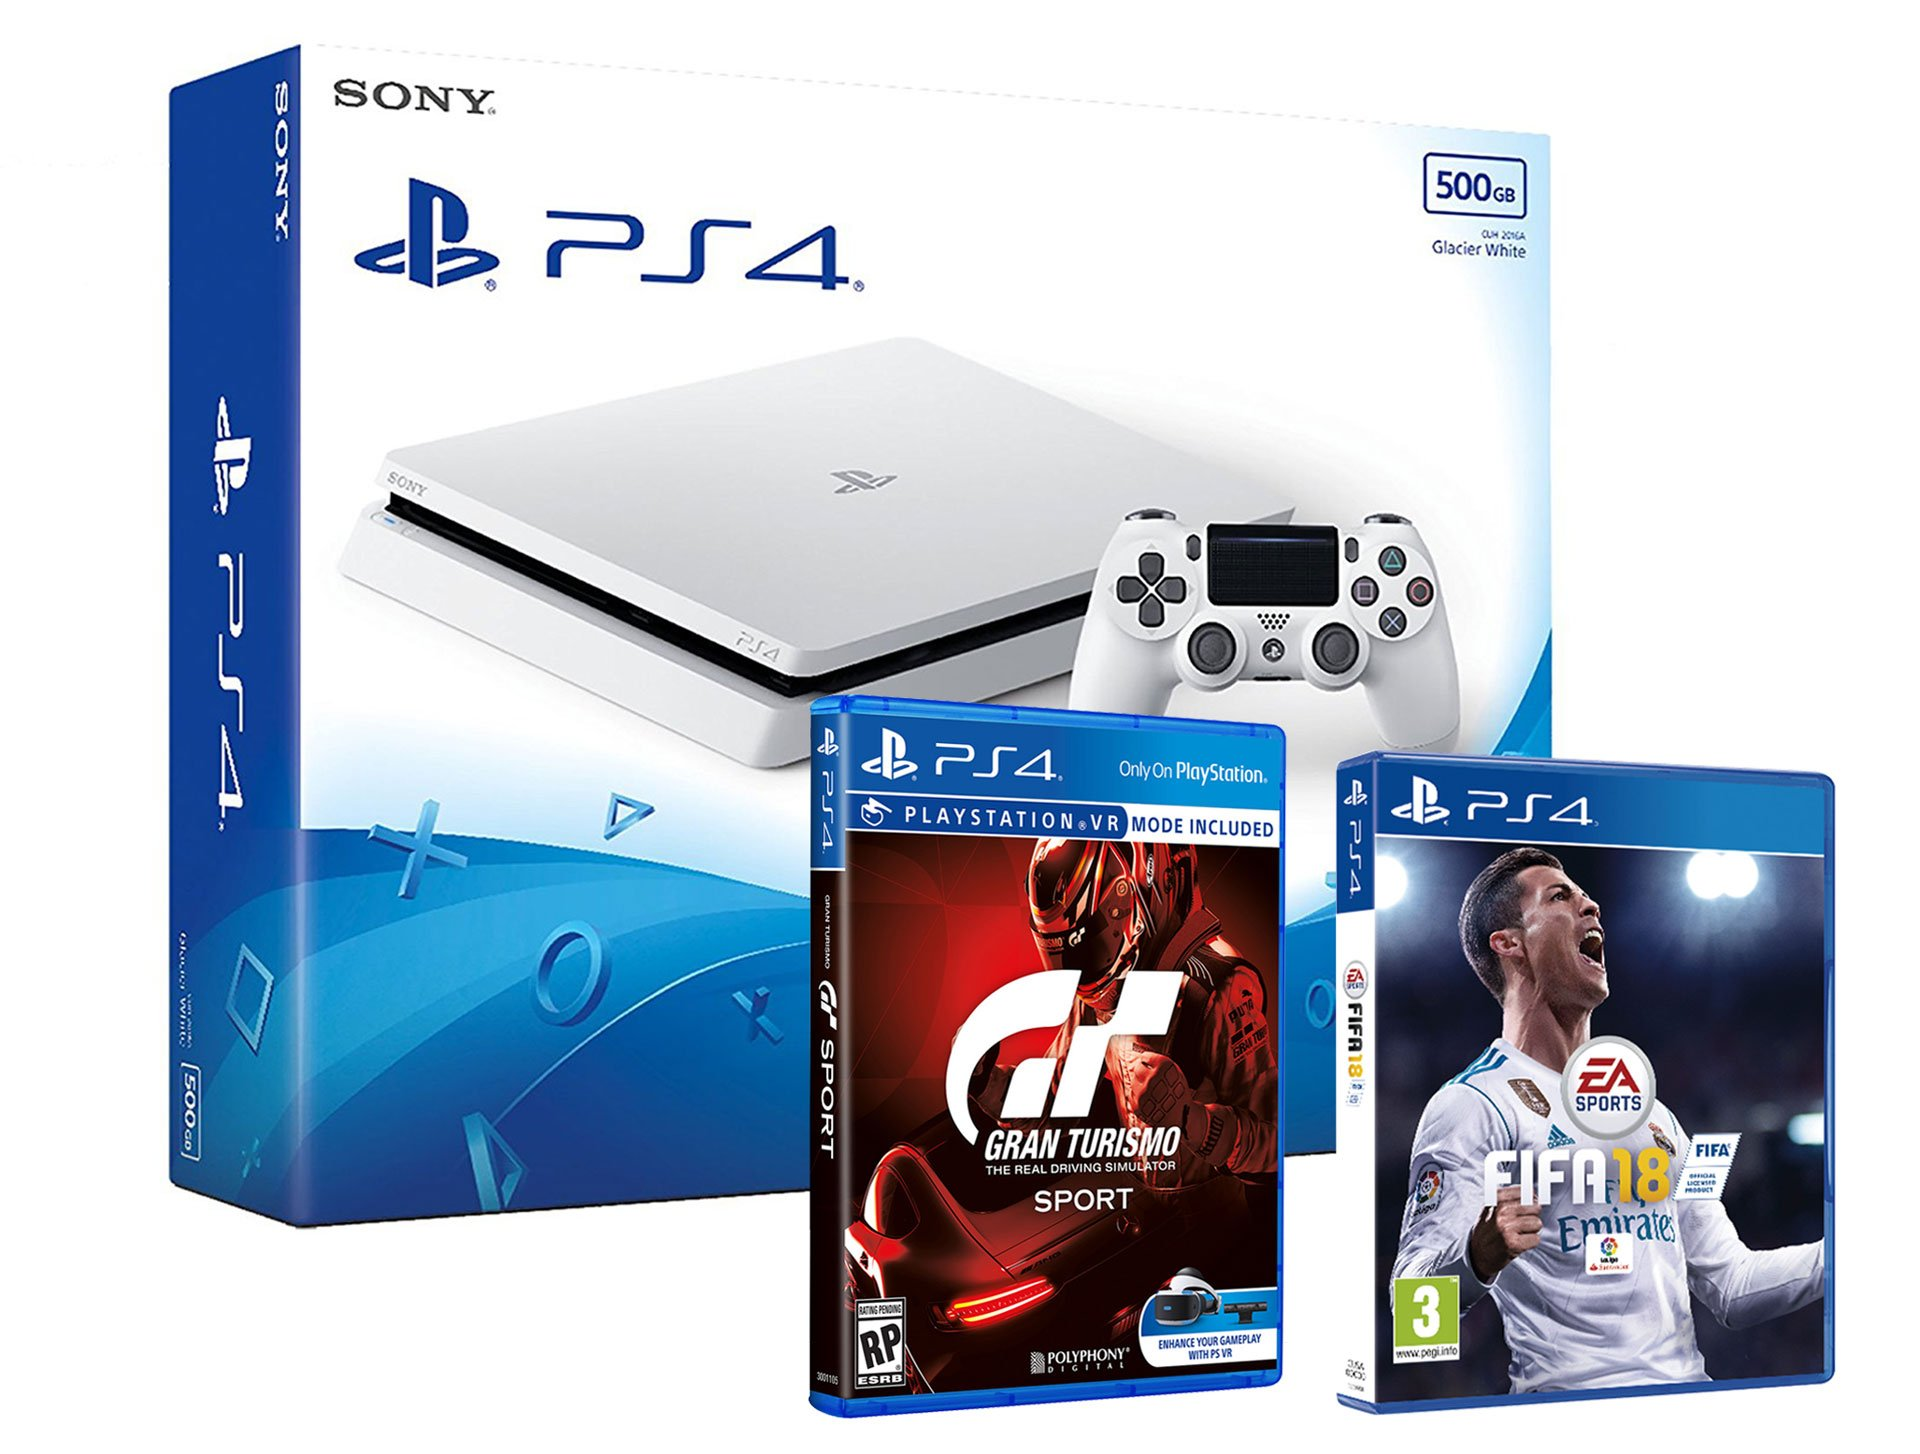 ps4 slim blanca consola 500gb pack 2 juegos fifa 18 gran turismo sport gt ebay. Black Bedroom Furniture Sets. Home Design Ideas